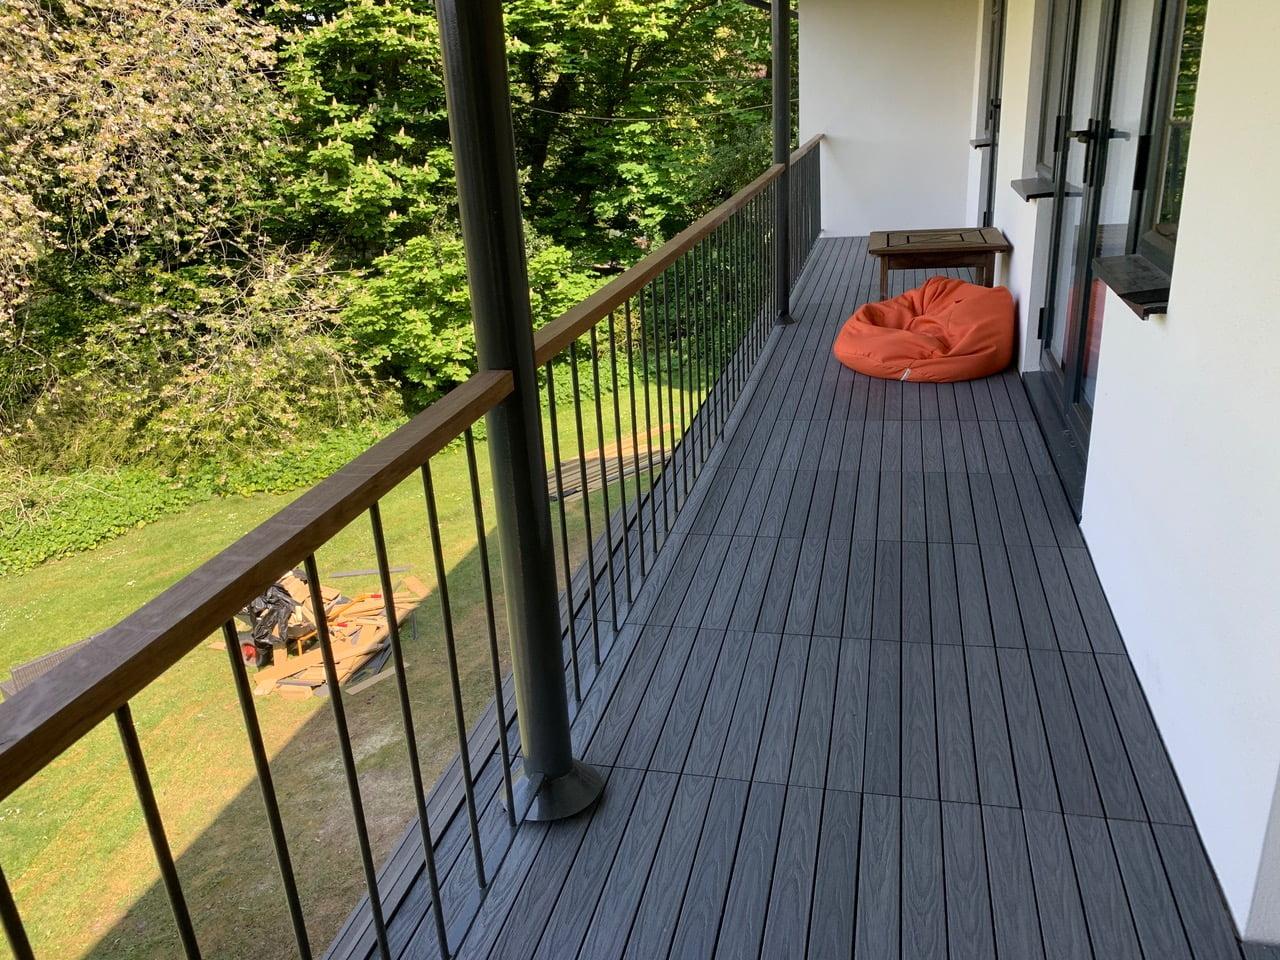 deck tiles on balcony